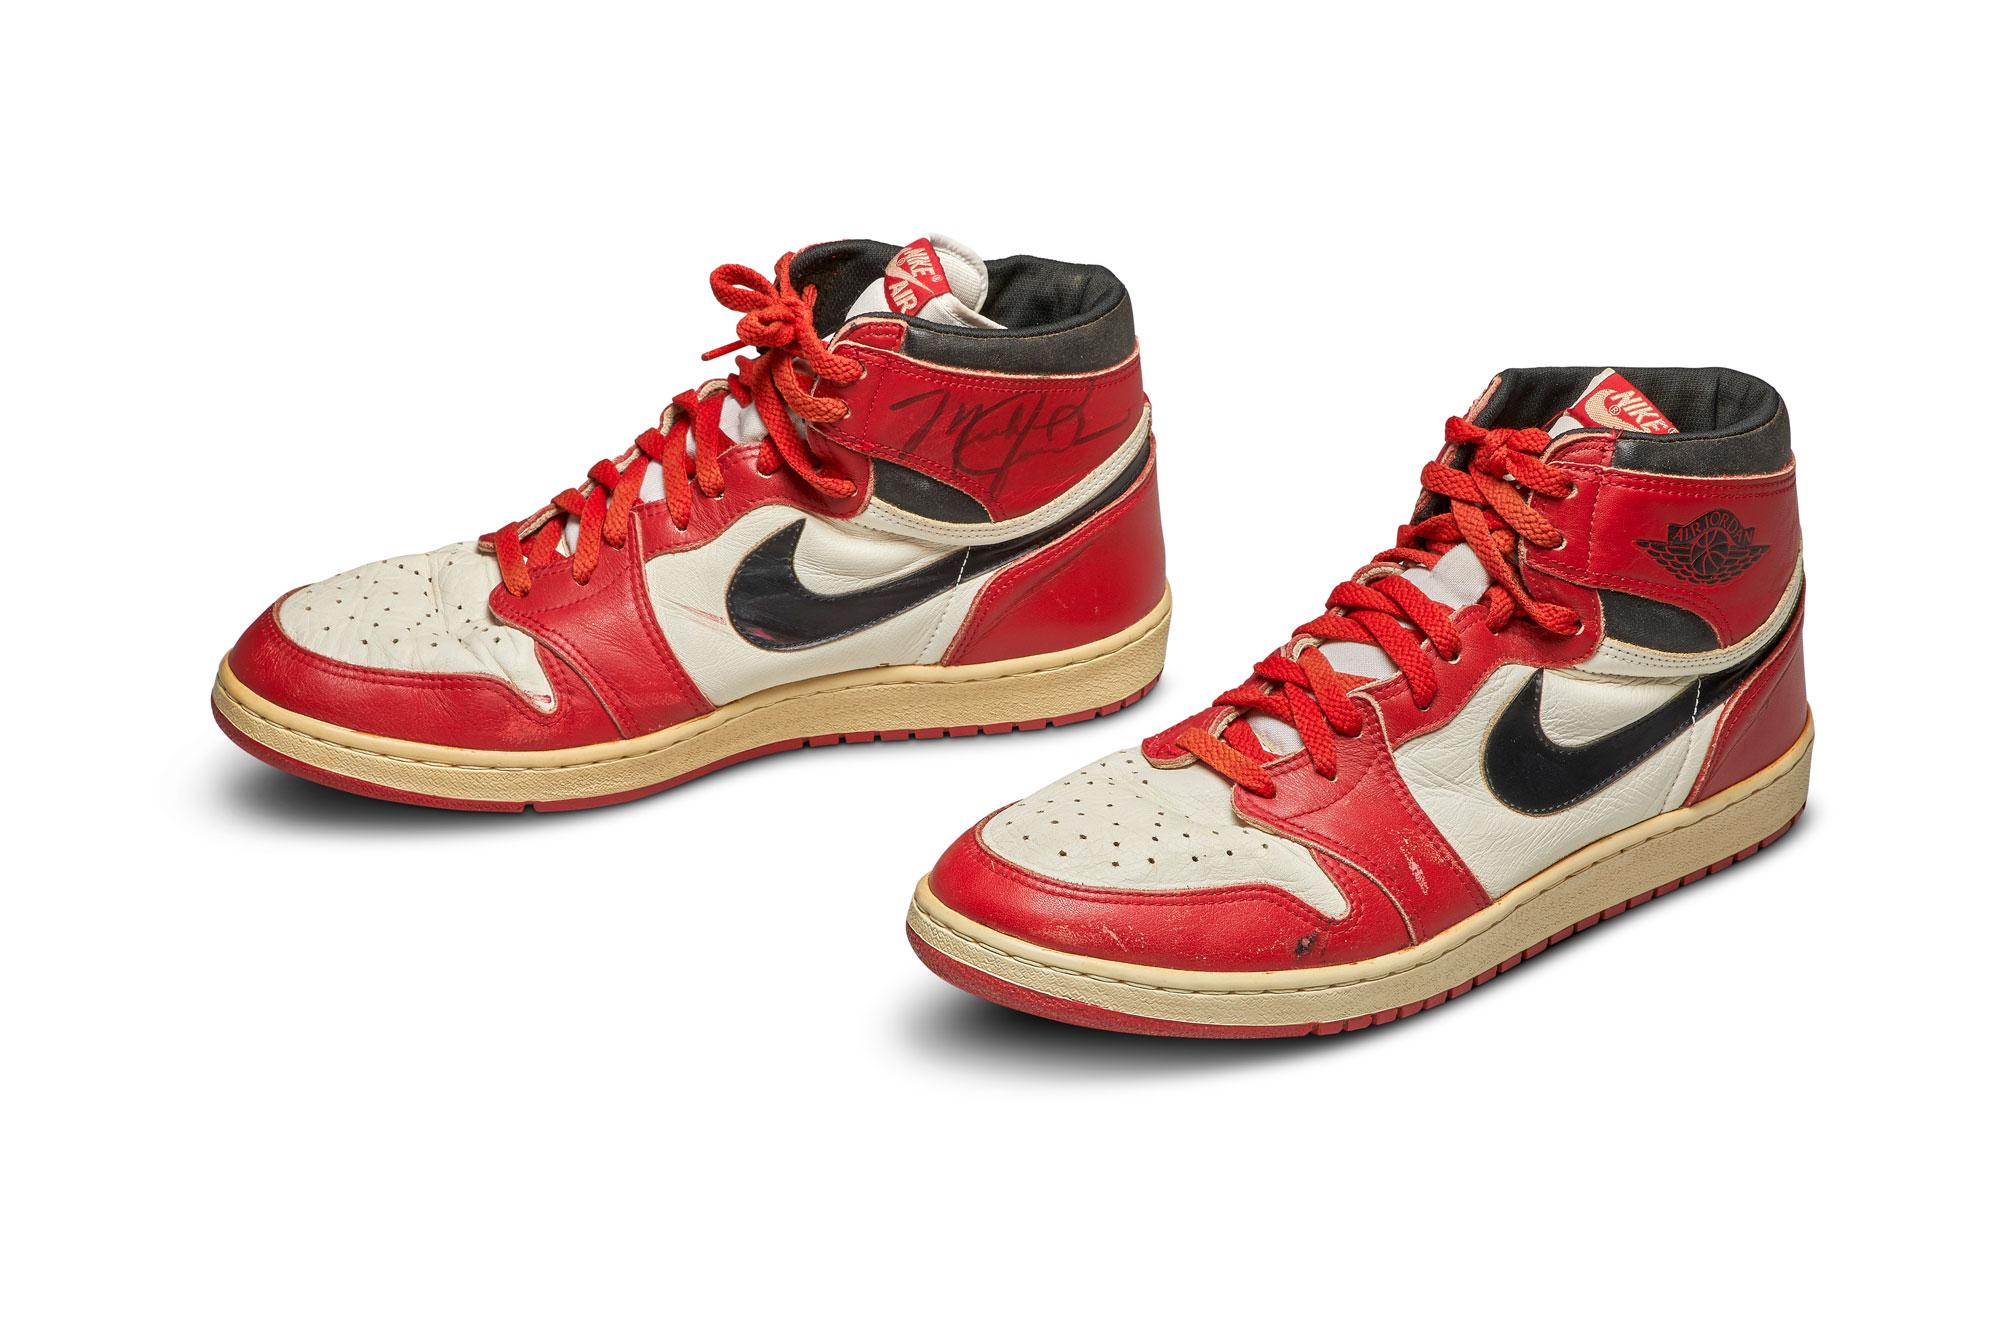 Michael Jordan's signature Air Jordan shoes from 1985 sell for ...